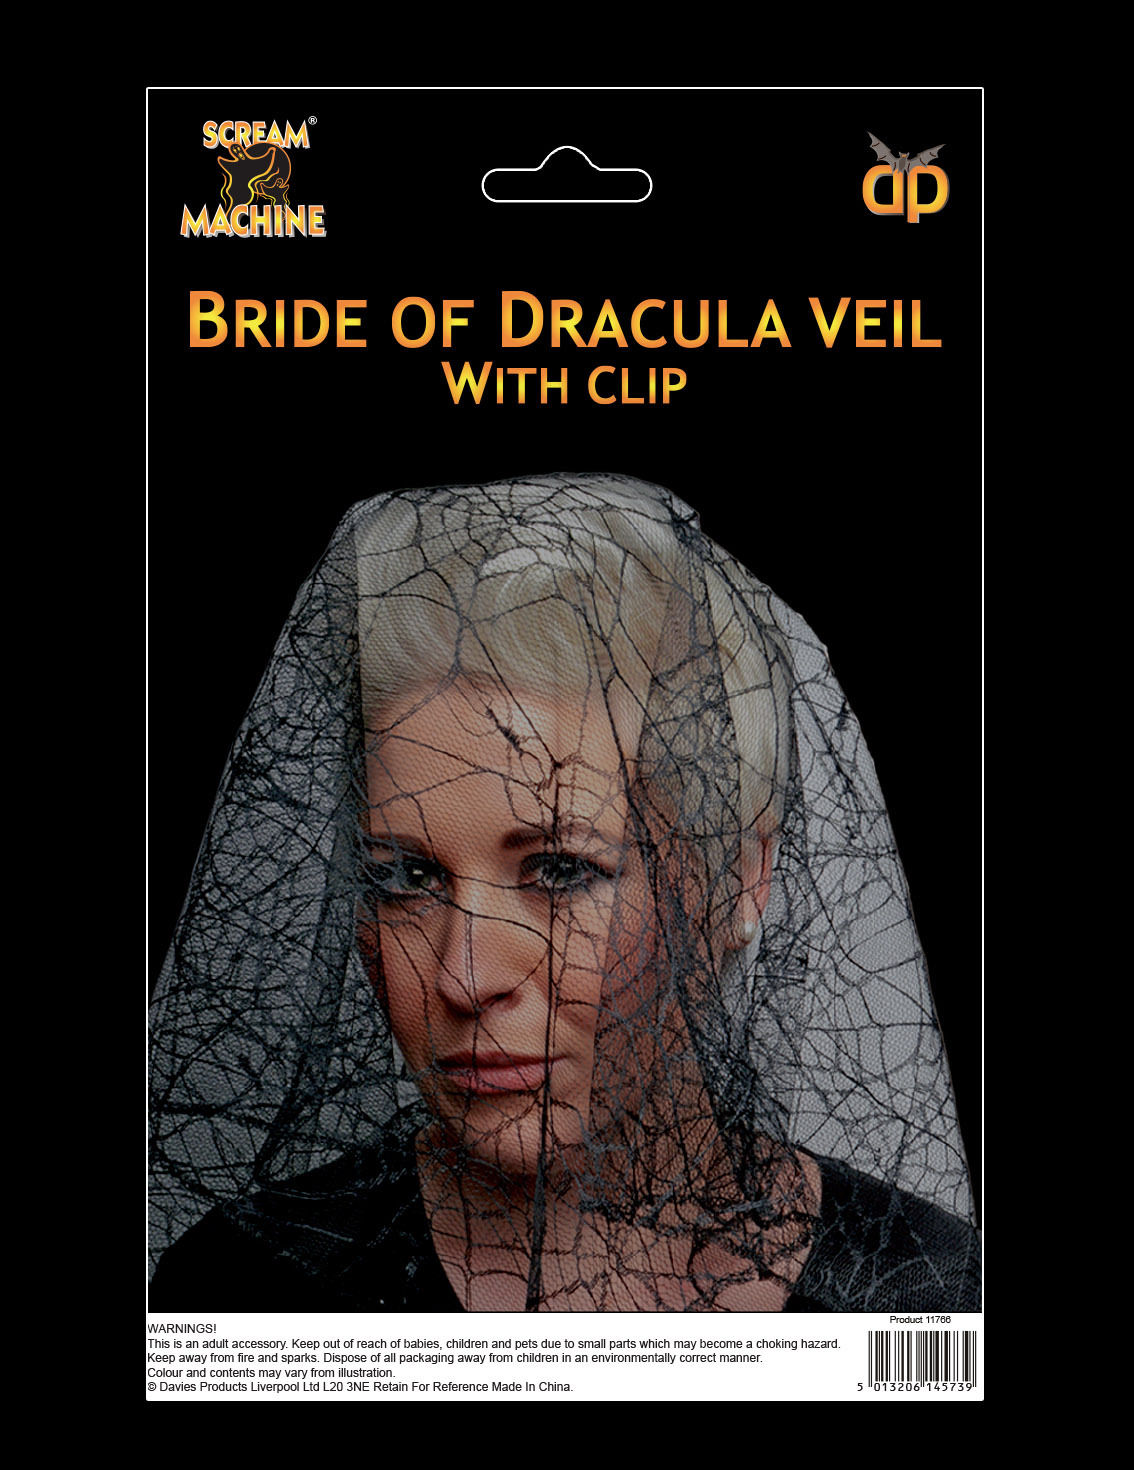 Details about Halloween Bride of Dracula Veil CHEAP HALLOWEEN Fancy Dress  Accessory Prop